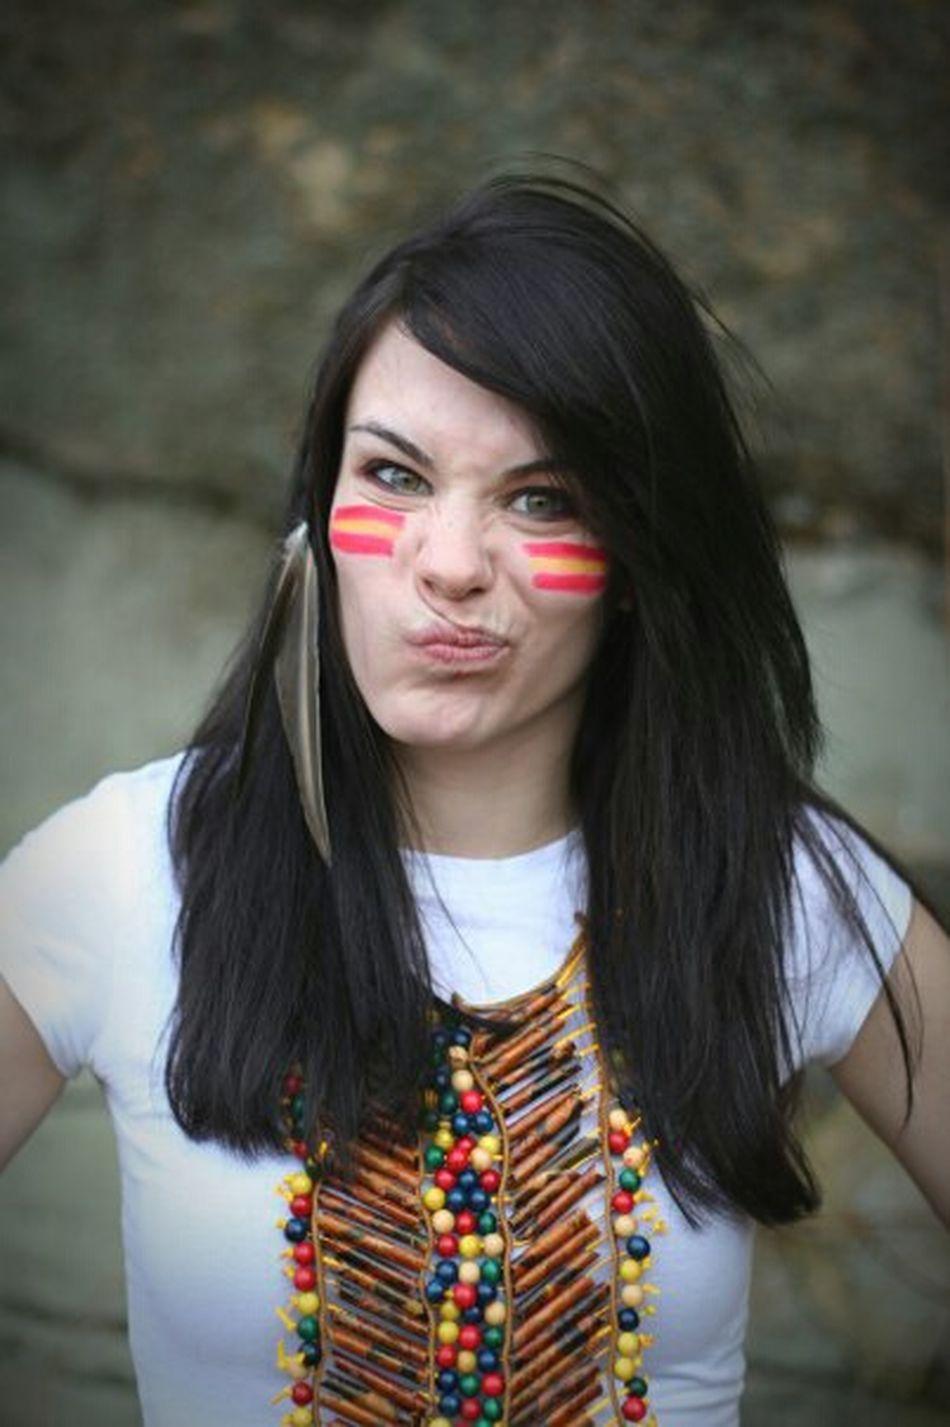 Girl Beautiful Photoshoot Photography Taking Photos Feather  Facepaint Grumpy